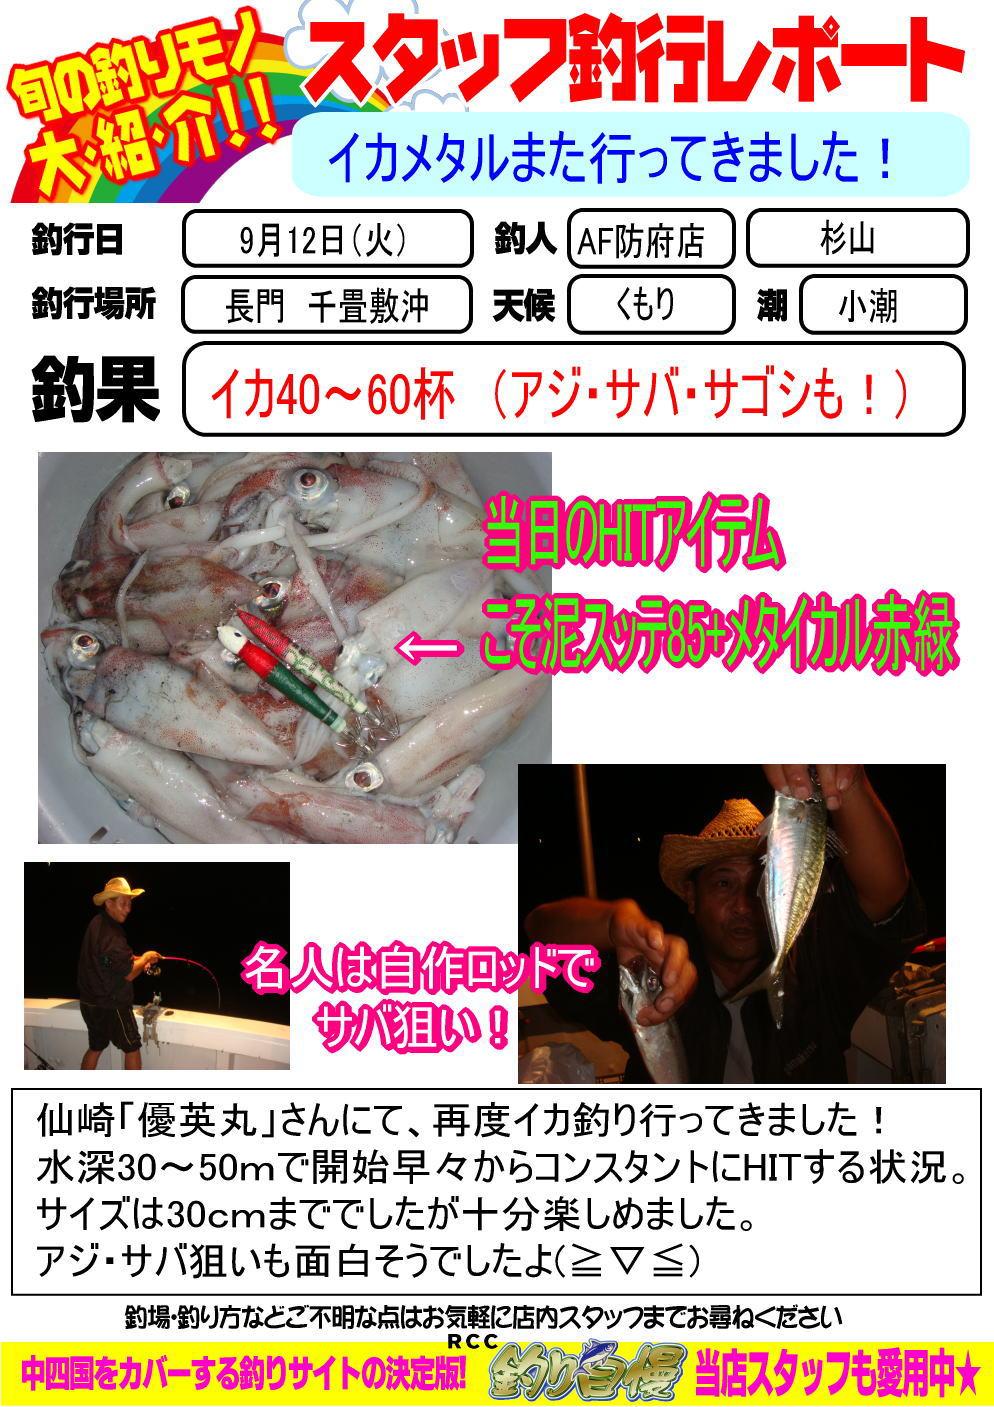 http://www.e-angle.co.jp/shop/blog/blog-20170912-houfu-ikametaru.jpg